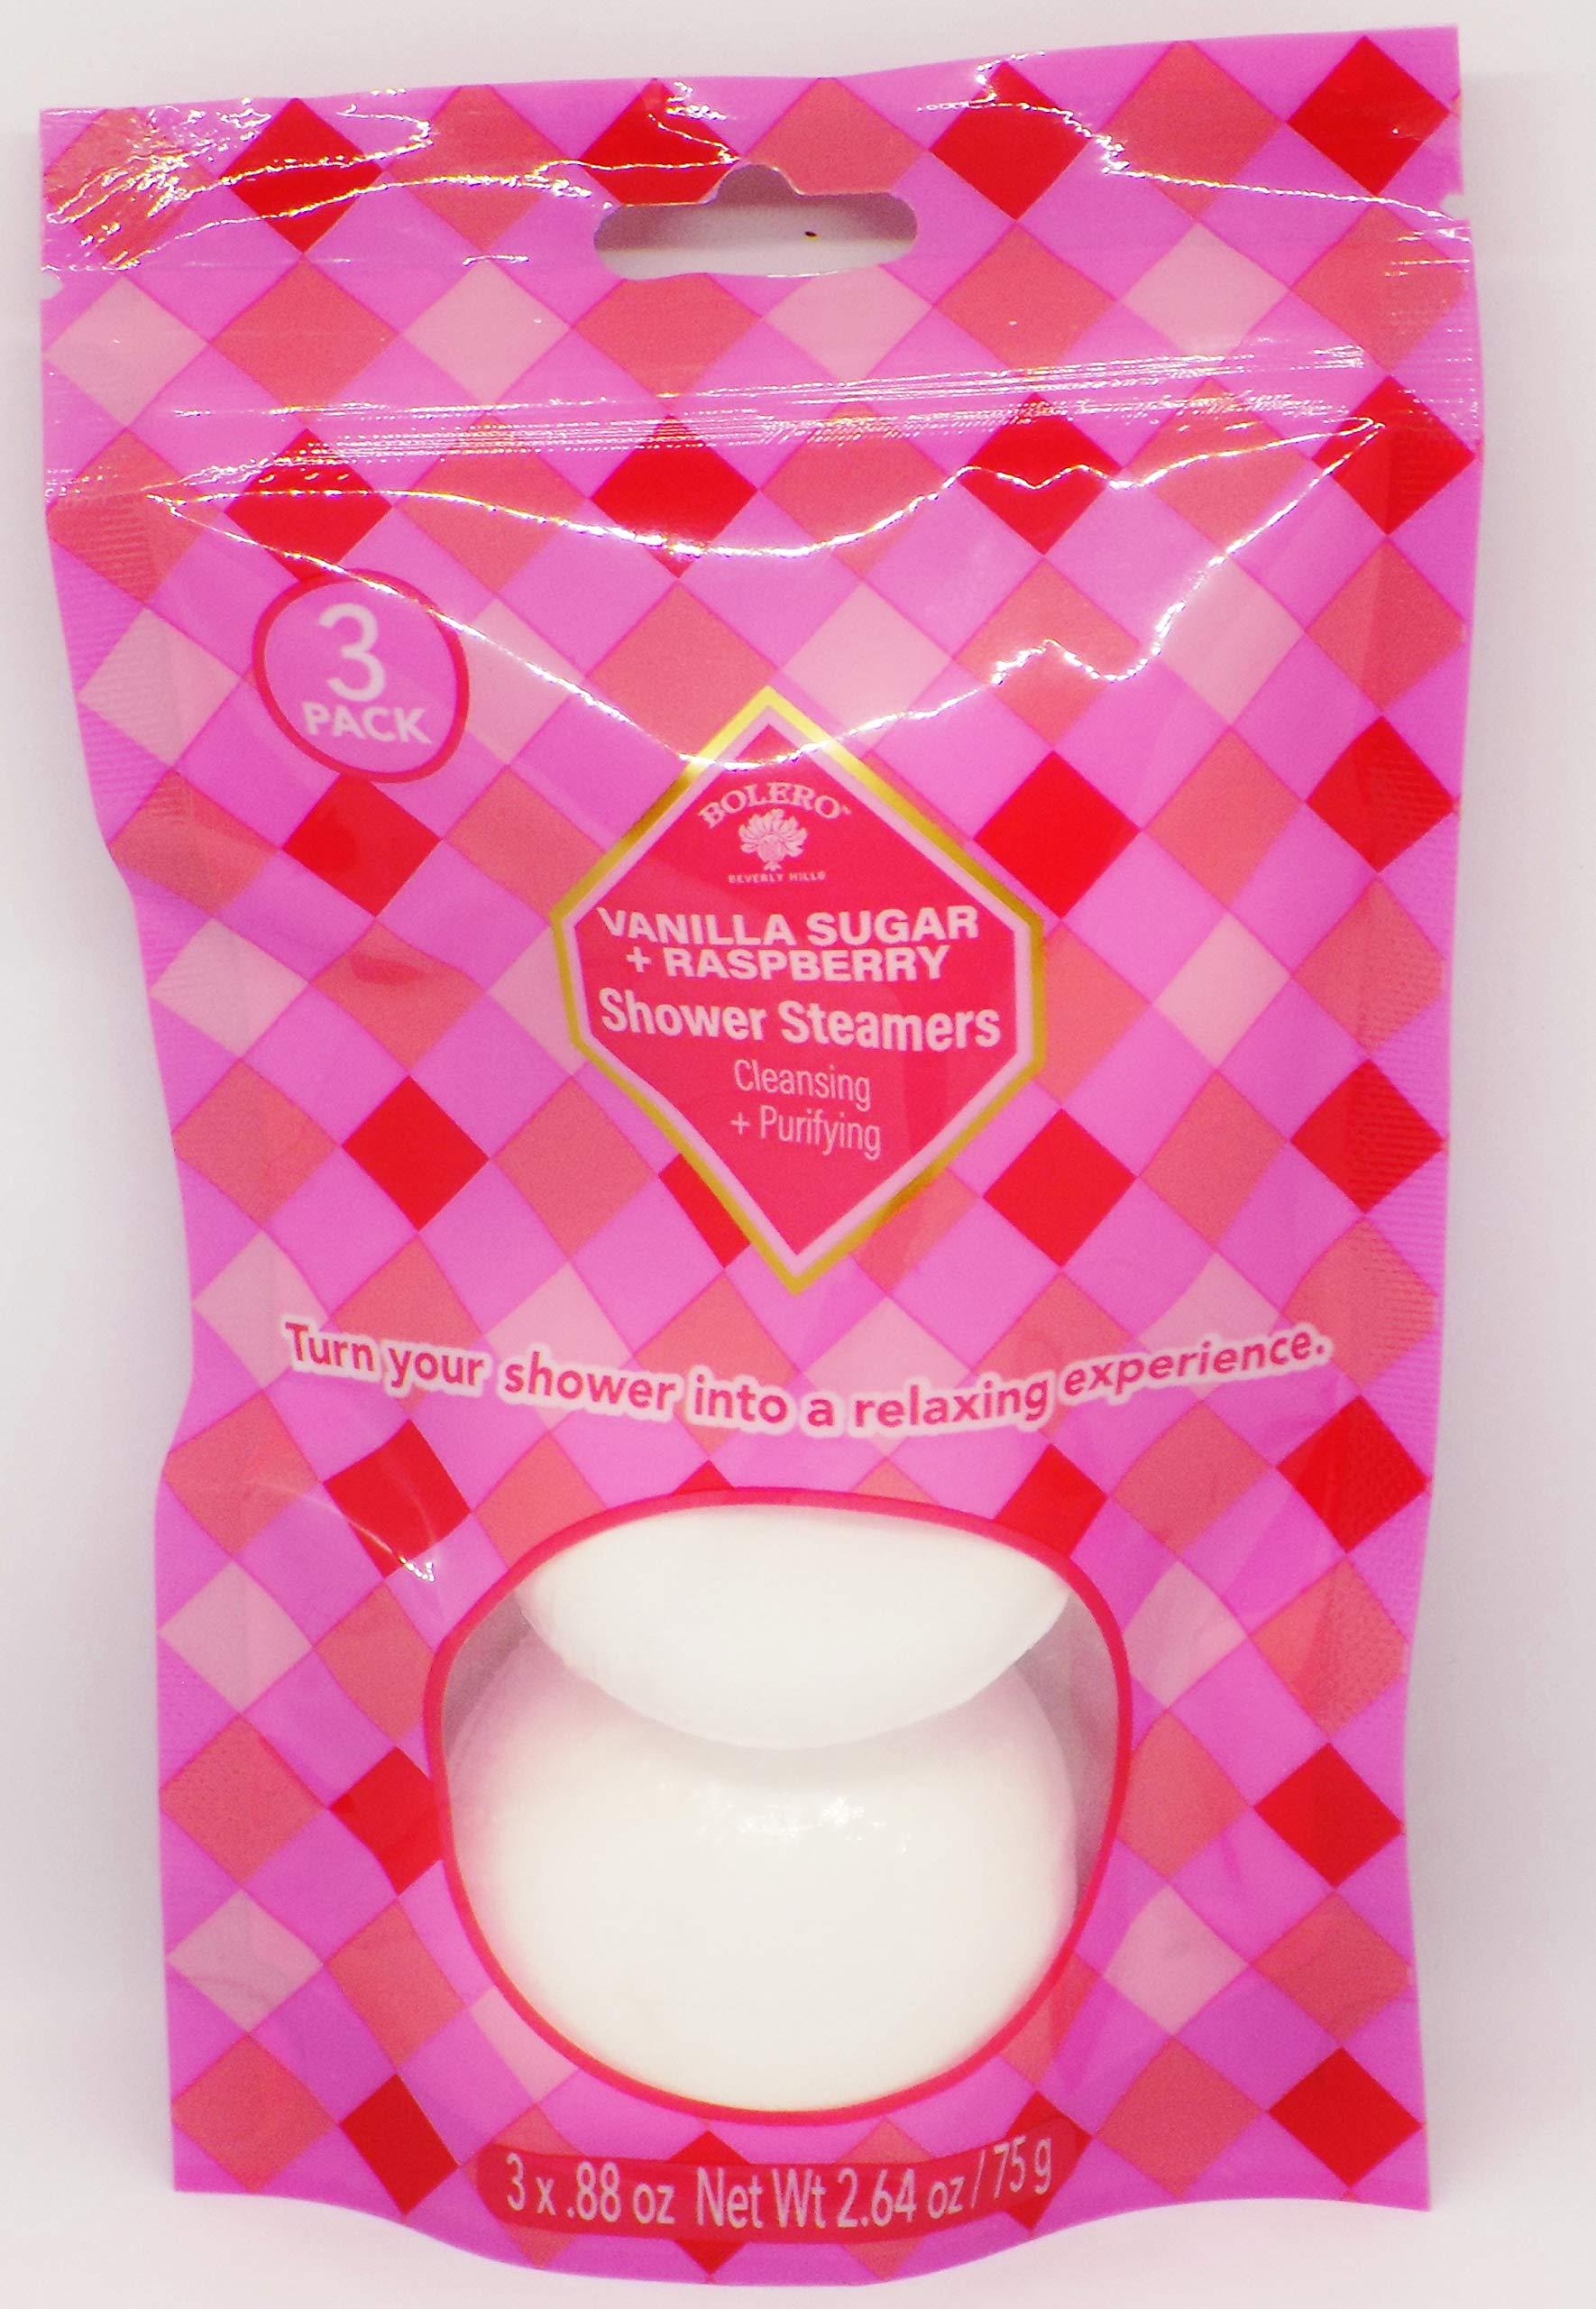 null - Bolero Vanilla Sugar & Raspberry Shower Steamers